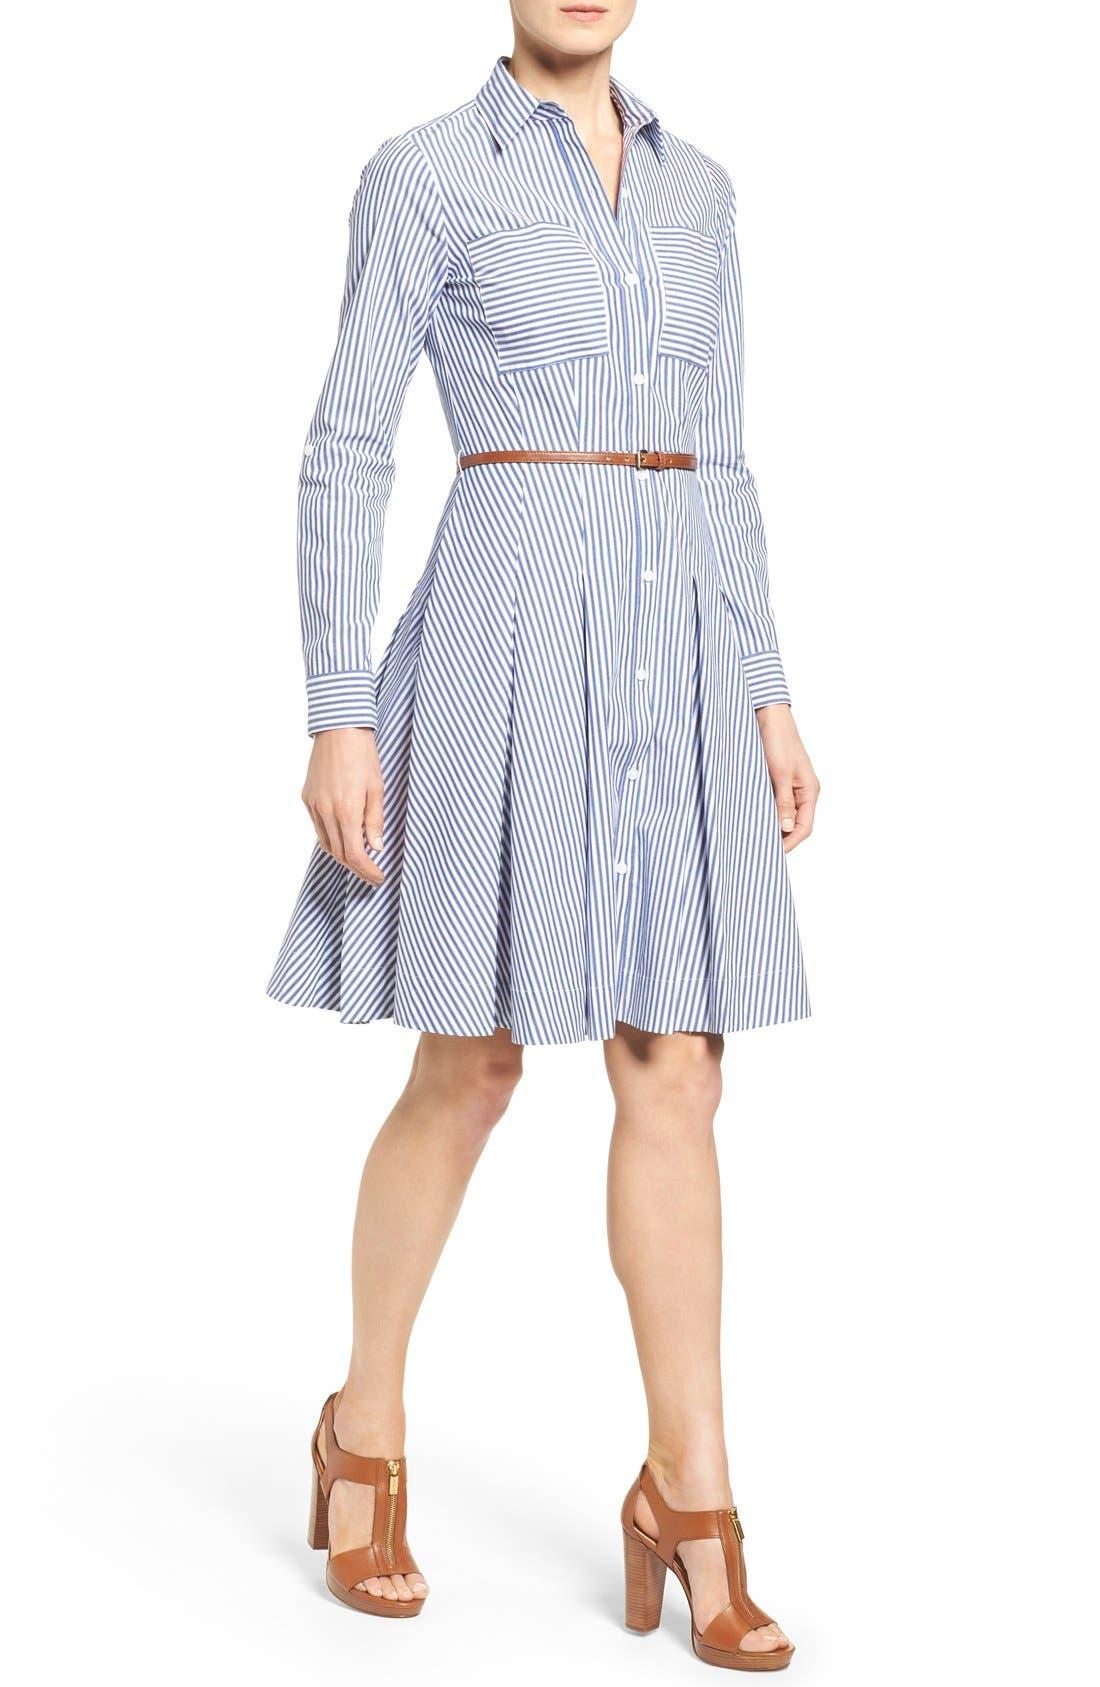 Alternate Image 1 Selected - MICHAEL Michael Kors Belted Stripe Stretch Cotton Shirtdress